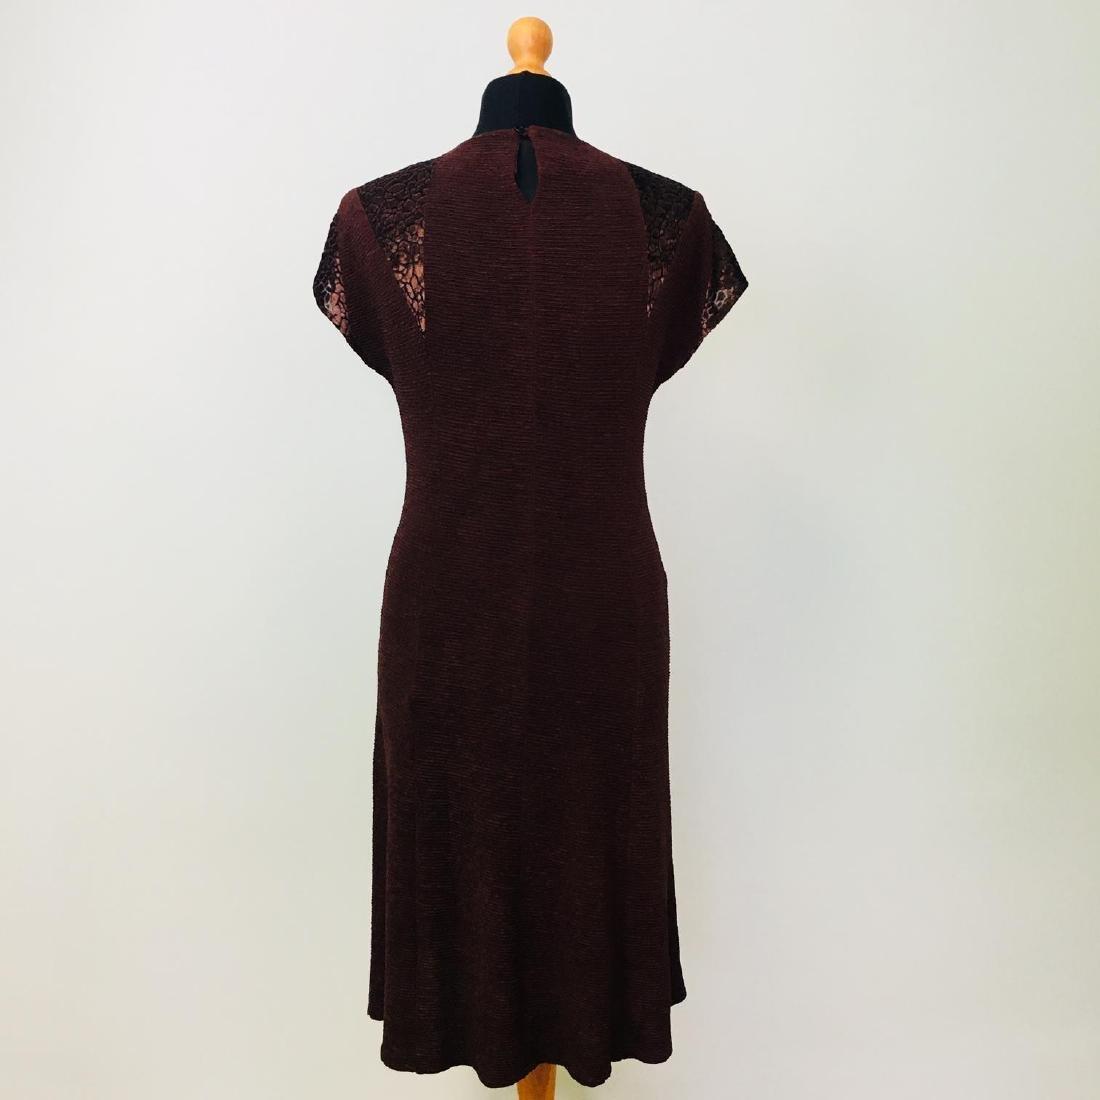 Vintage Women's 2 Piece Evening Jacket Dress Size M - 7